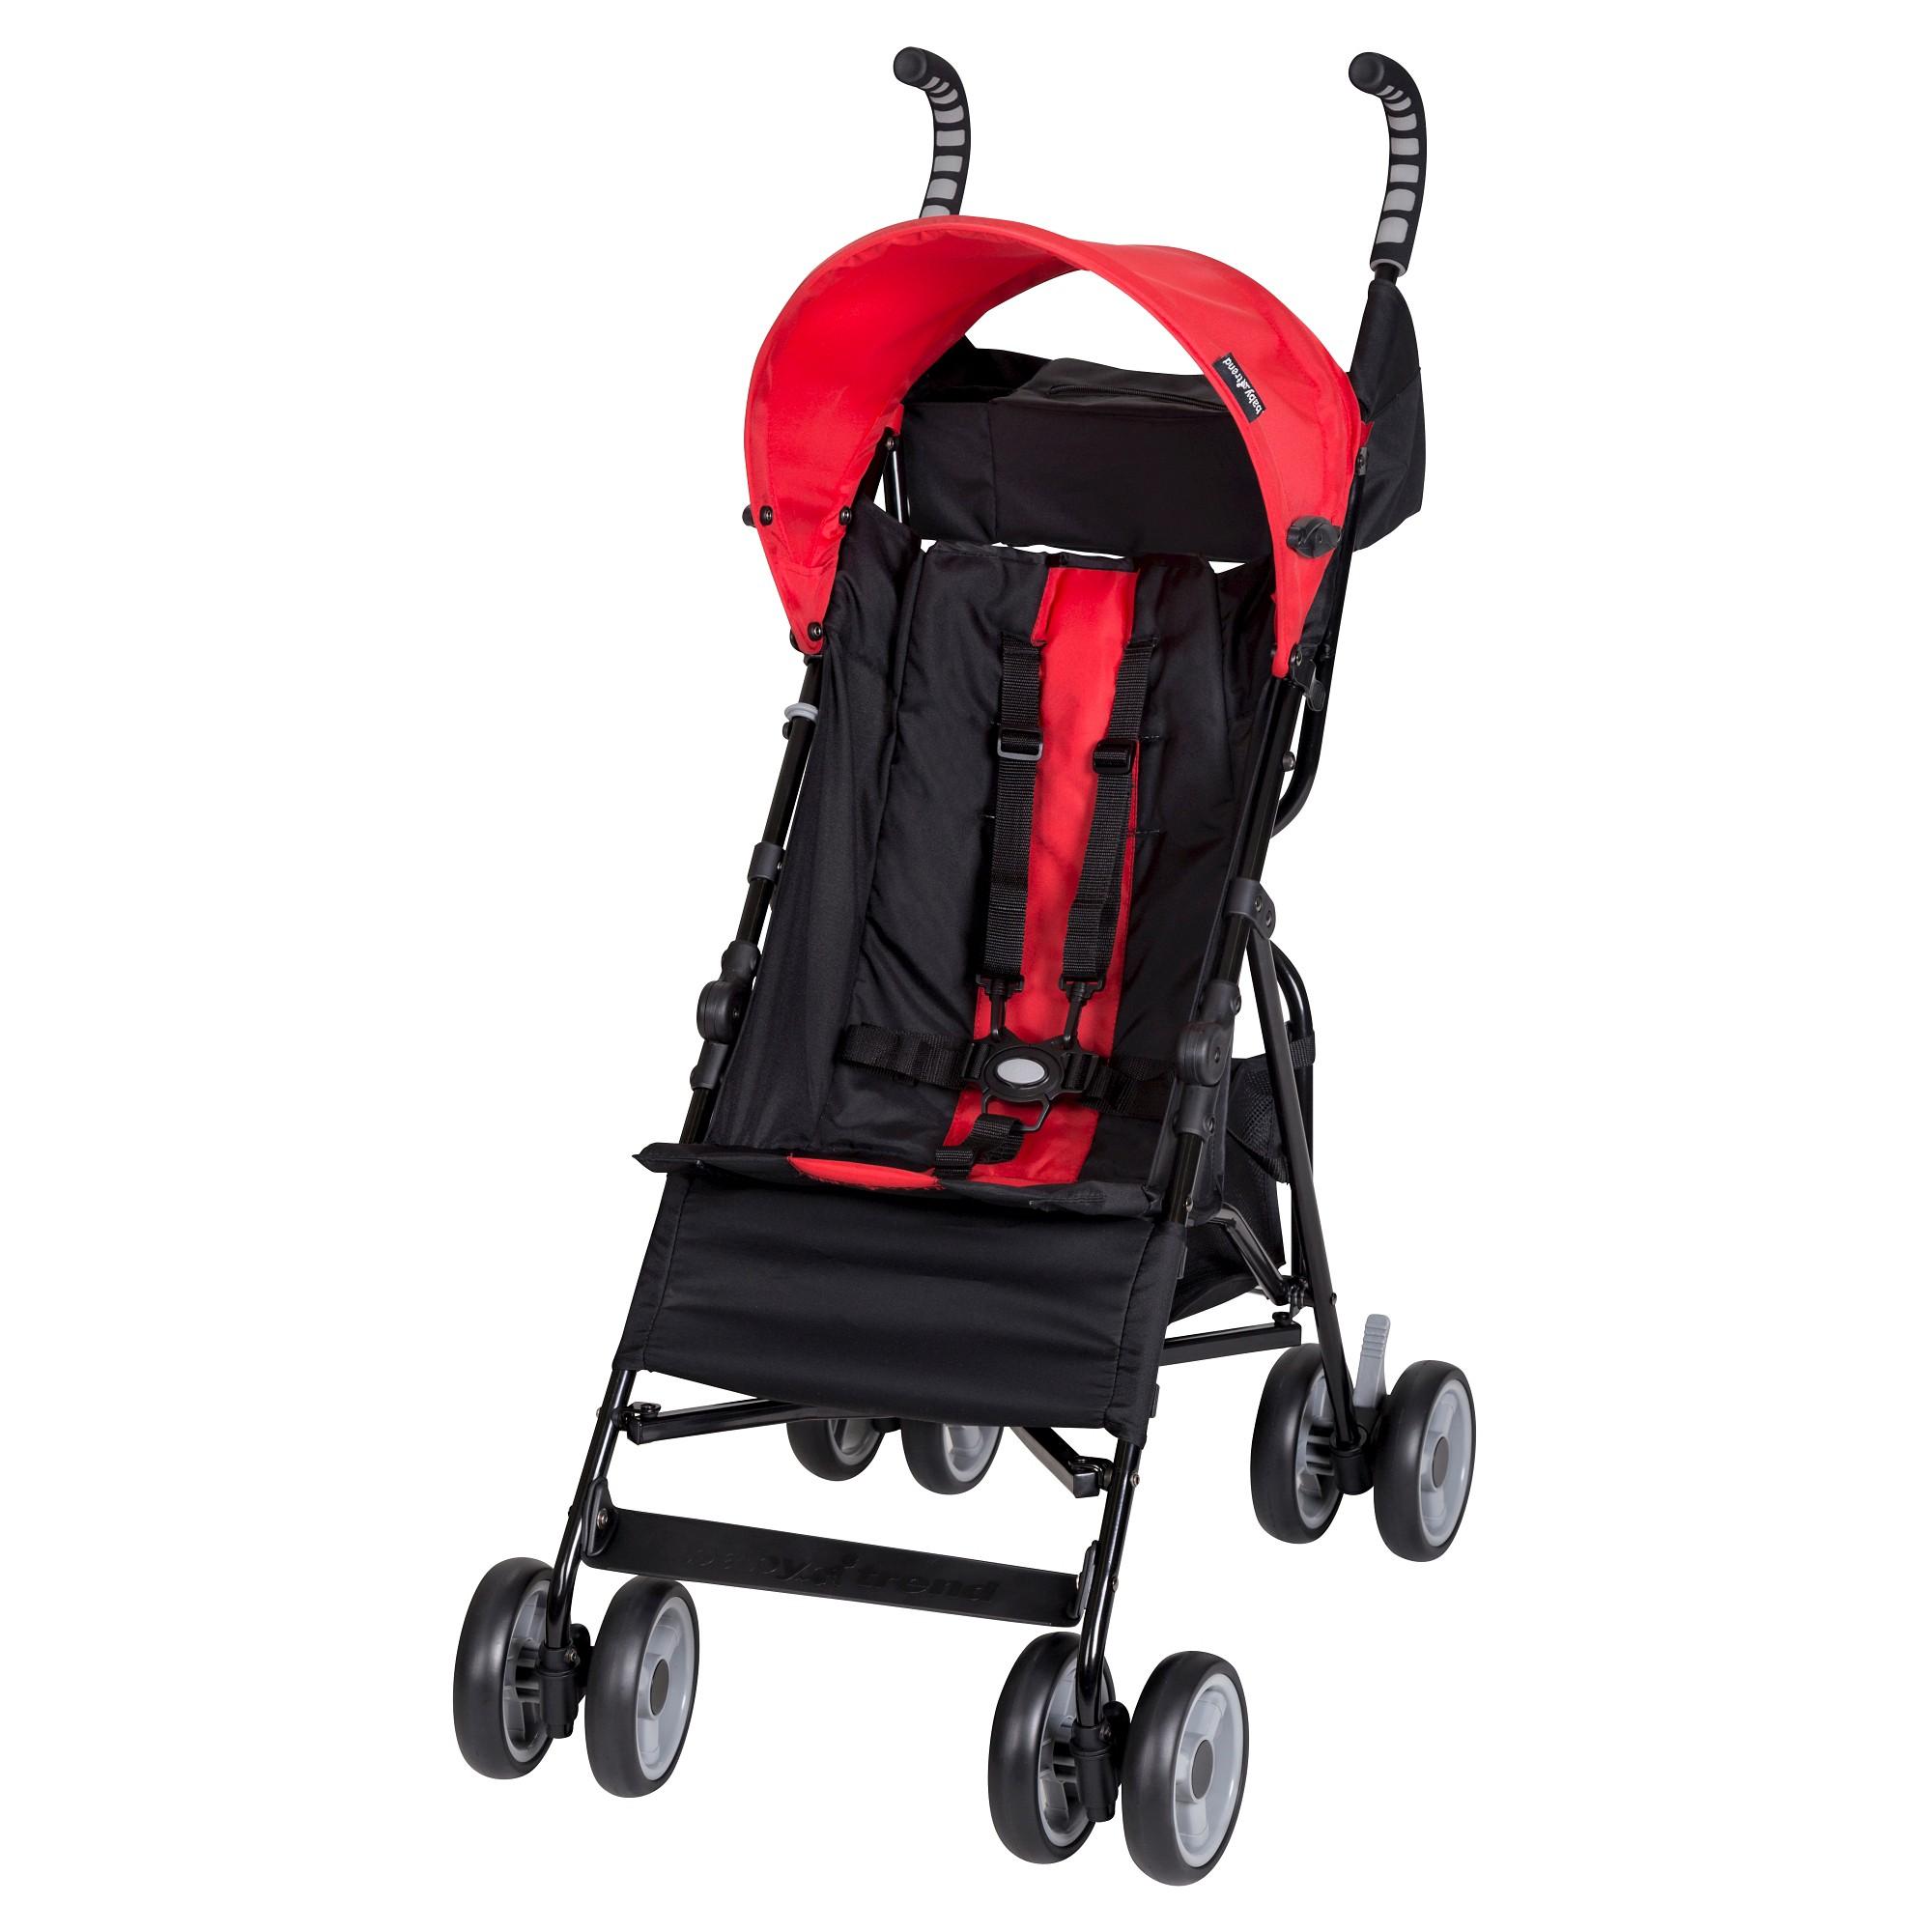 Baby Trend Rocket Stroller, Black Baby strollers, Best